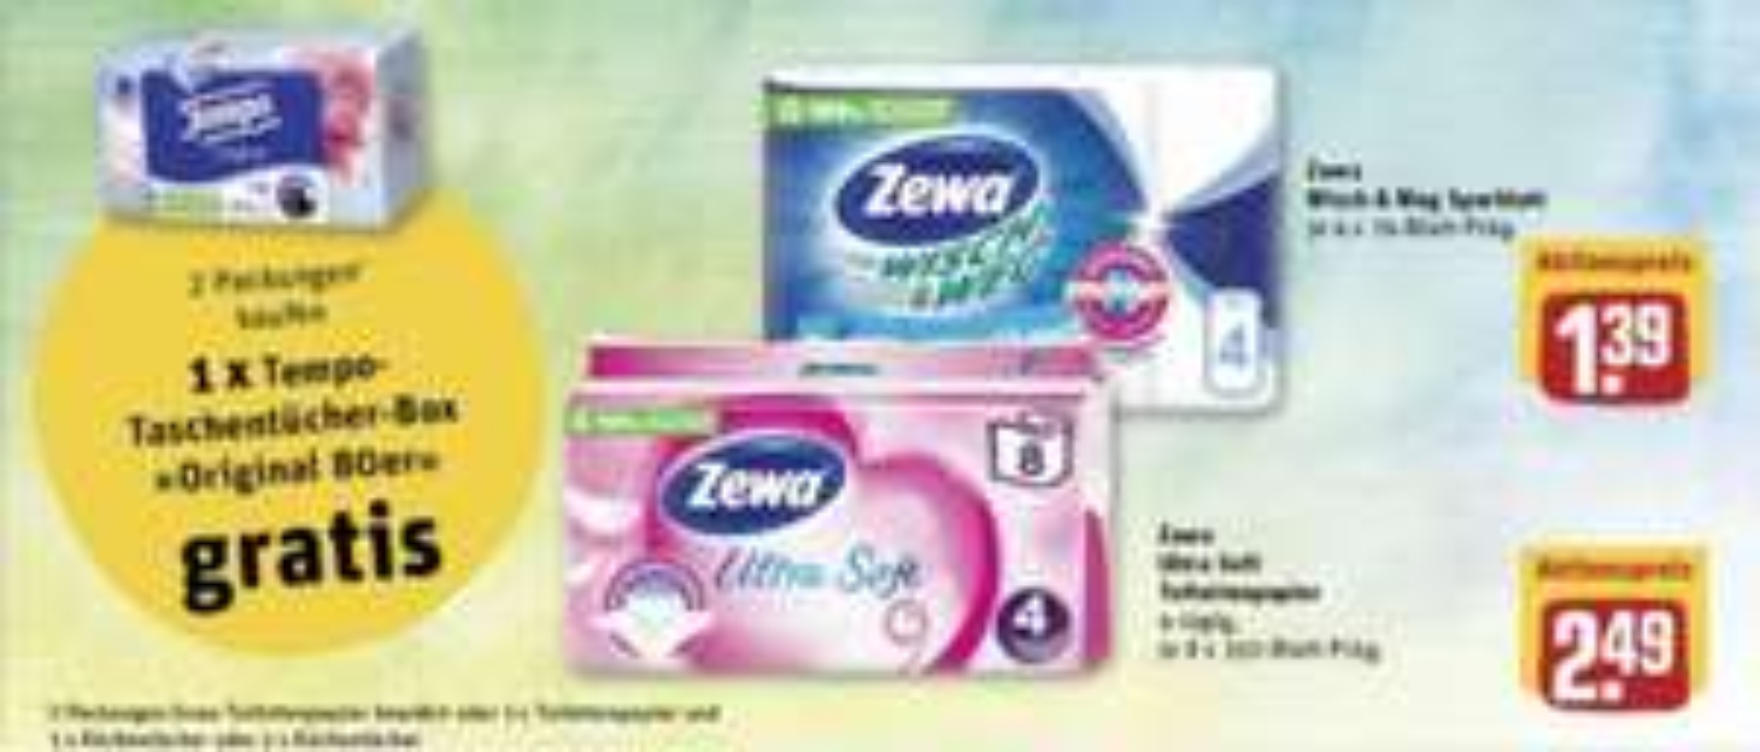 Rewe: Tempo Box Gratis bei Kauf 2 * Zewa